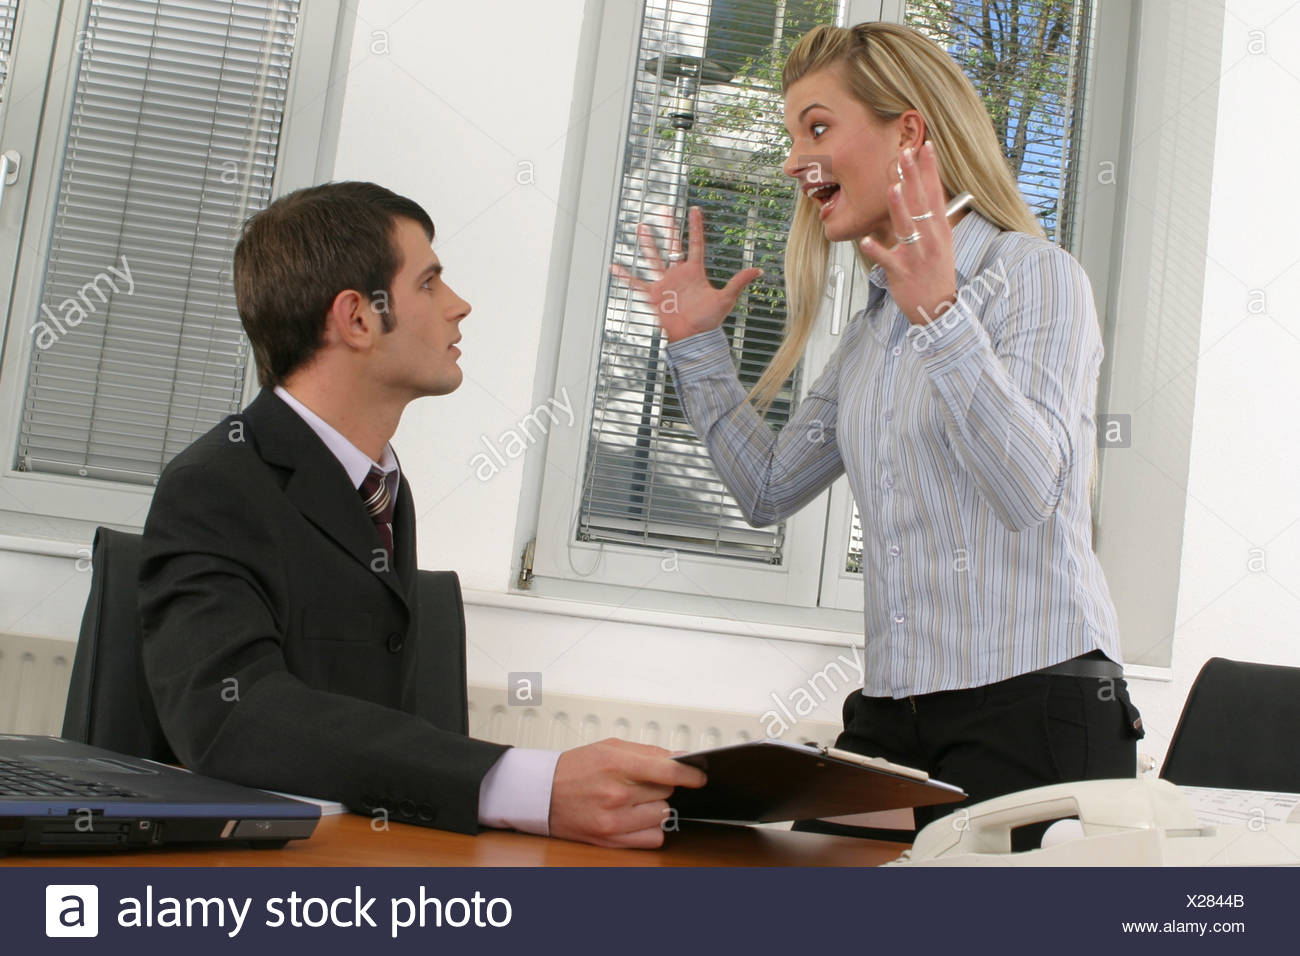 Two employees in office Zwei Angestellte im Buero Stock Photo